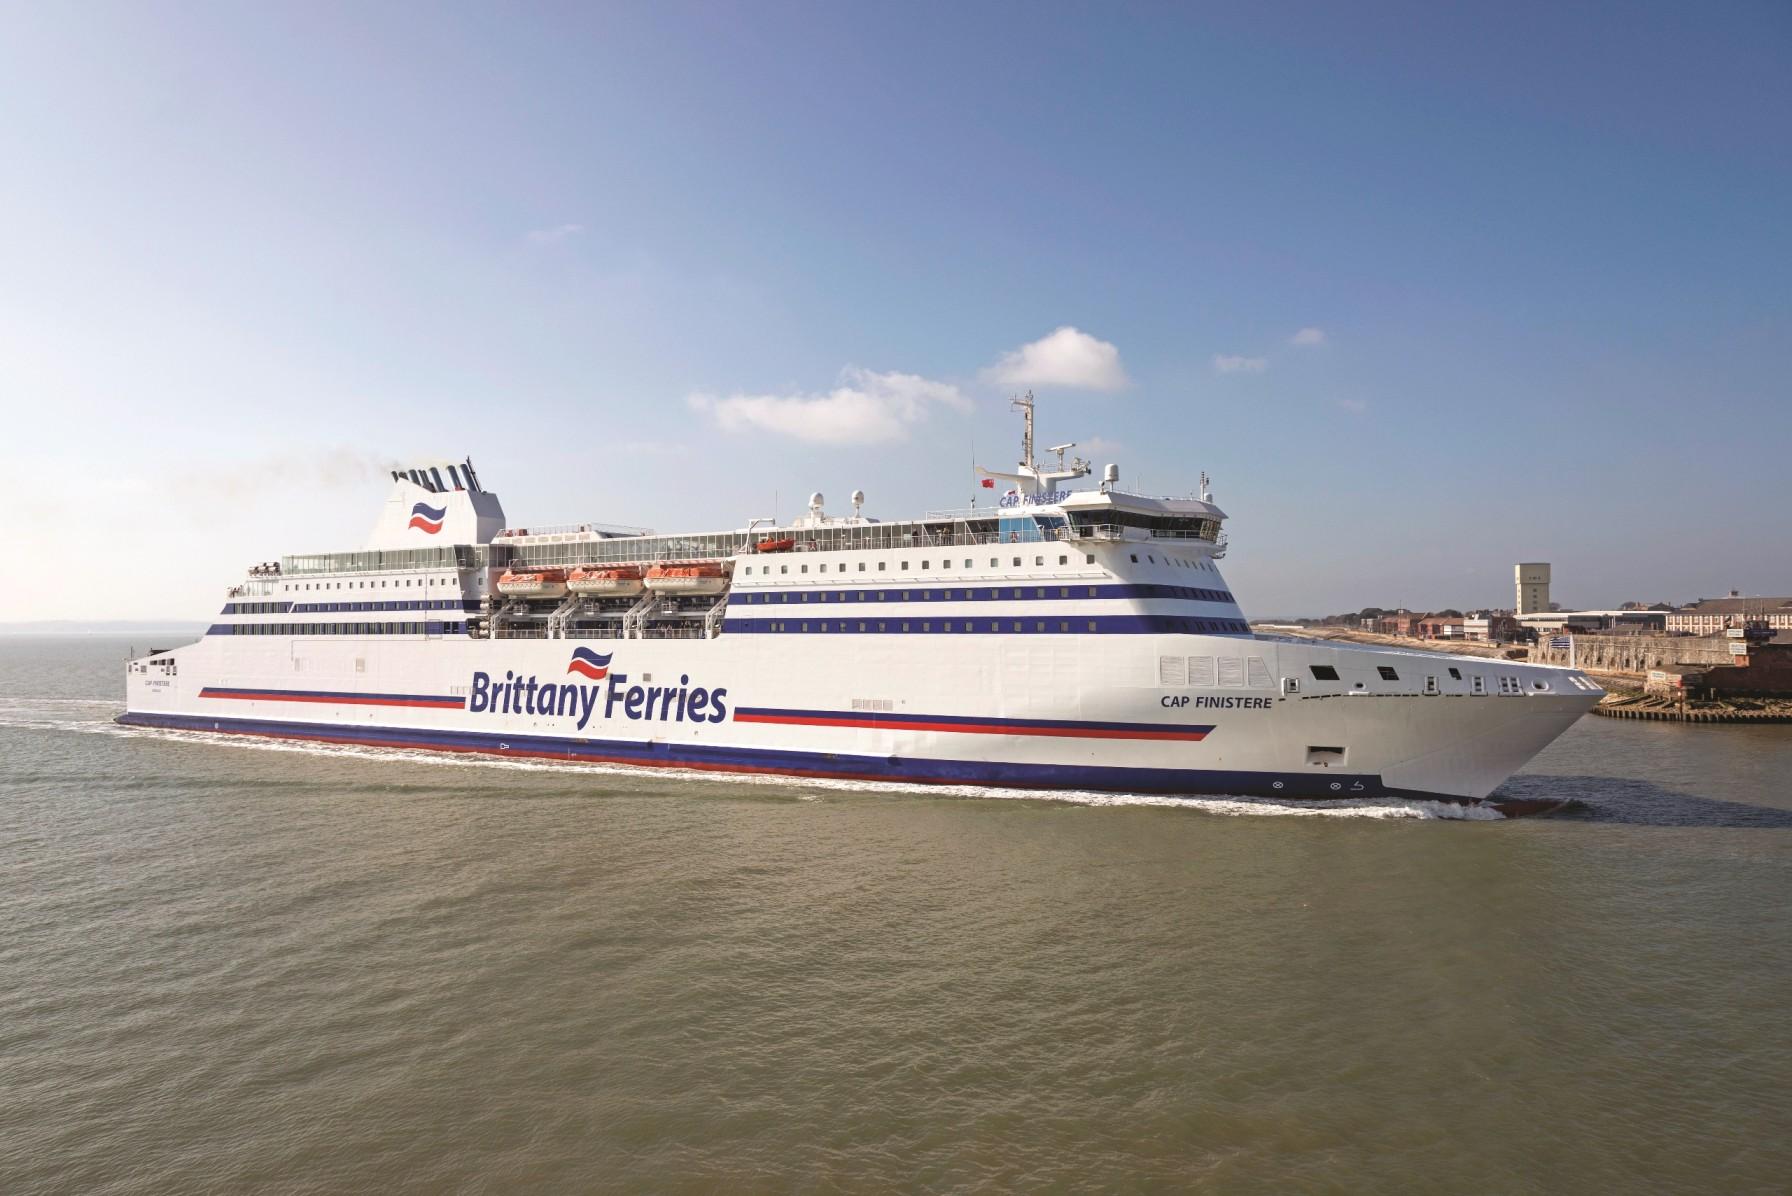 Uno de los buques de Brittany Ferries, Cap Finistere.